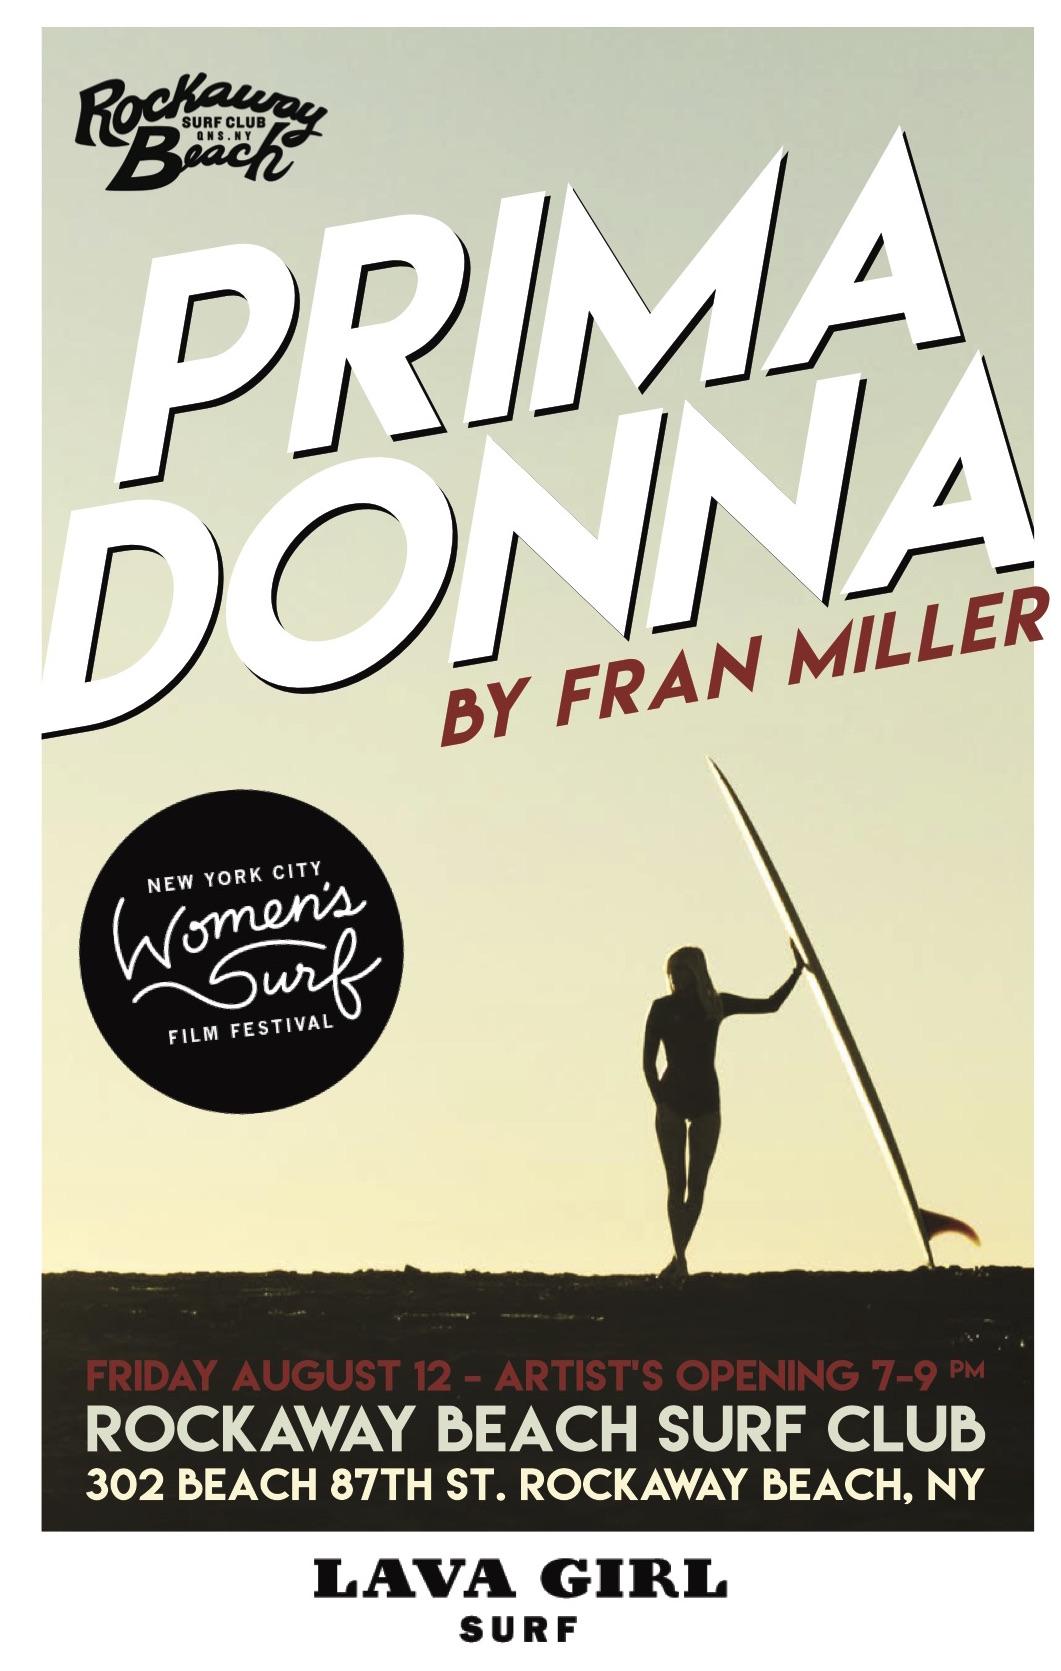 fran miller prima donna lava girl surf nyc womens surf film festival